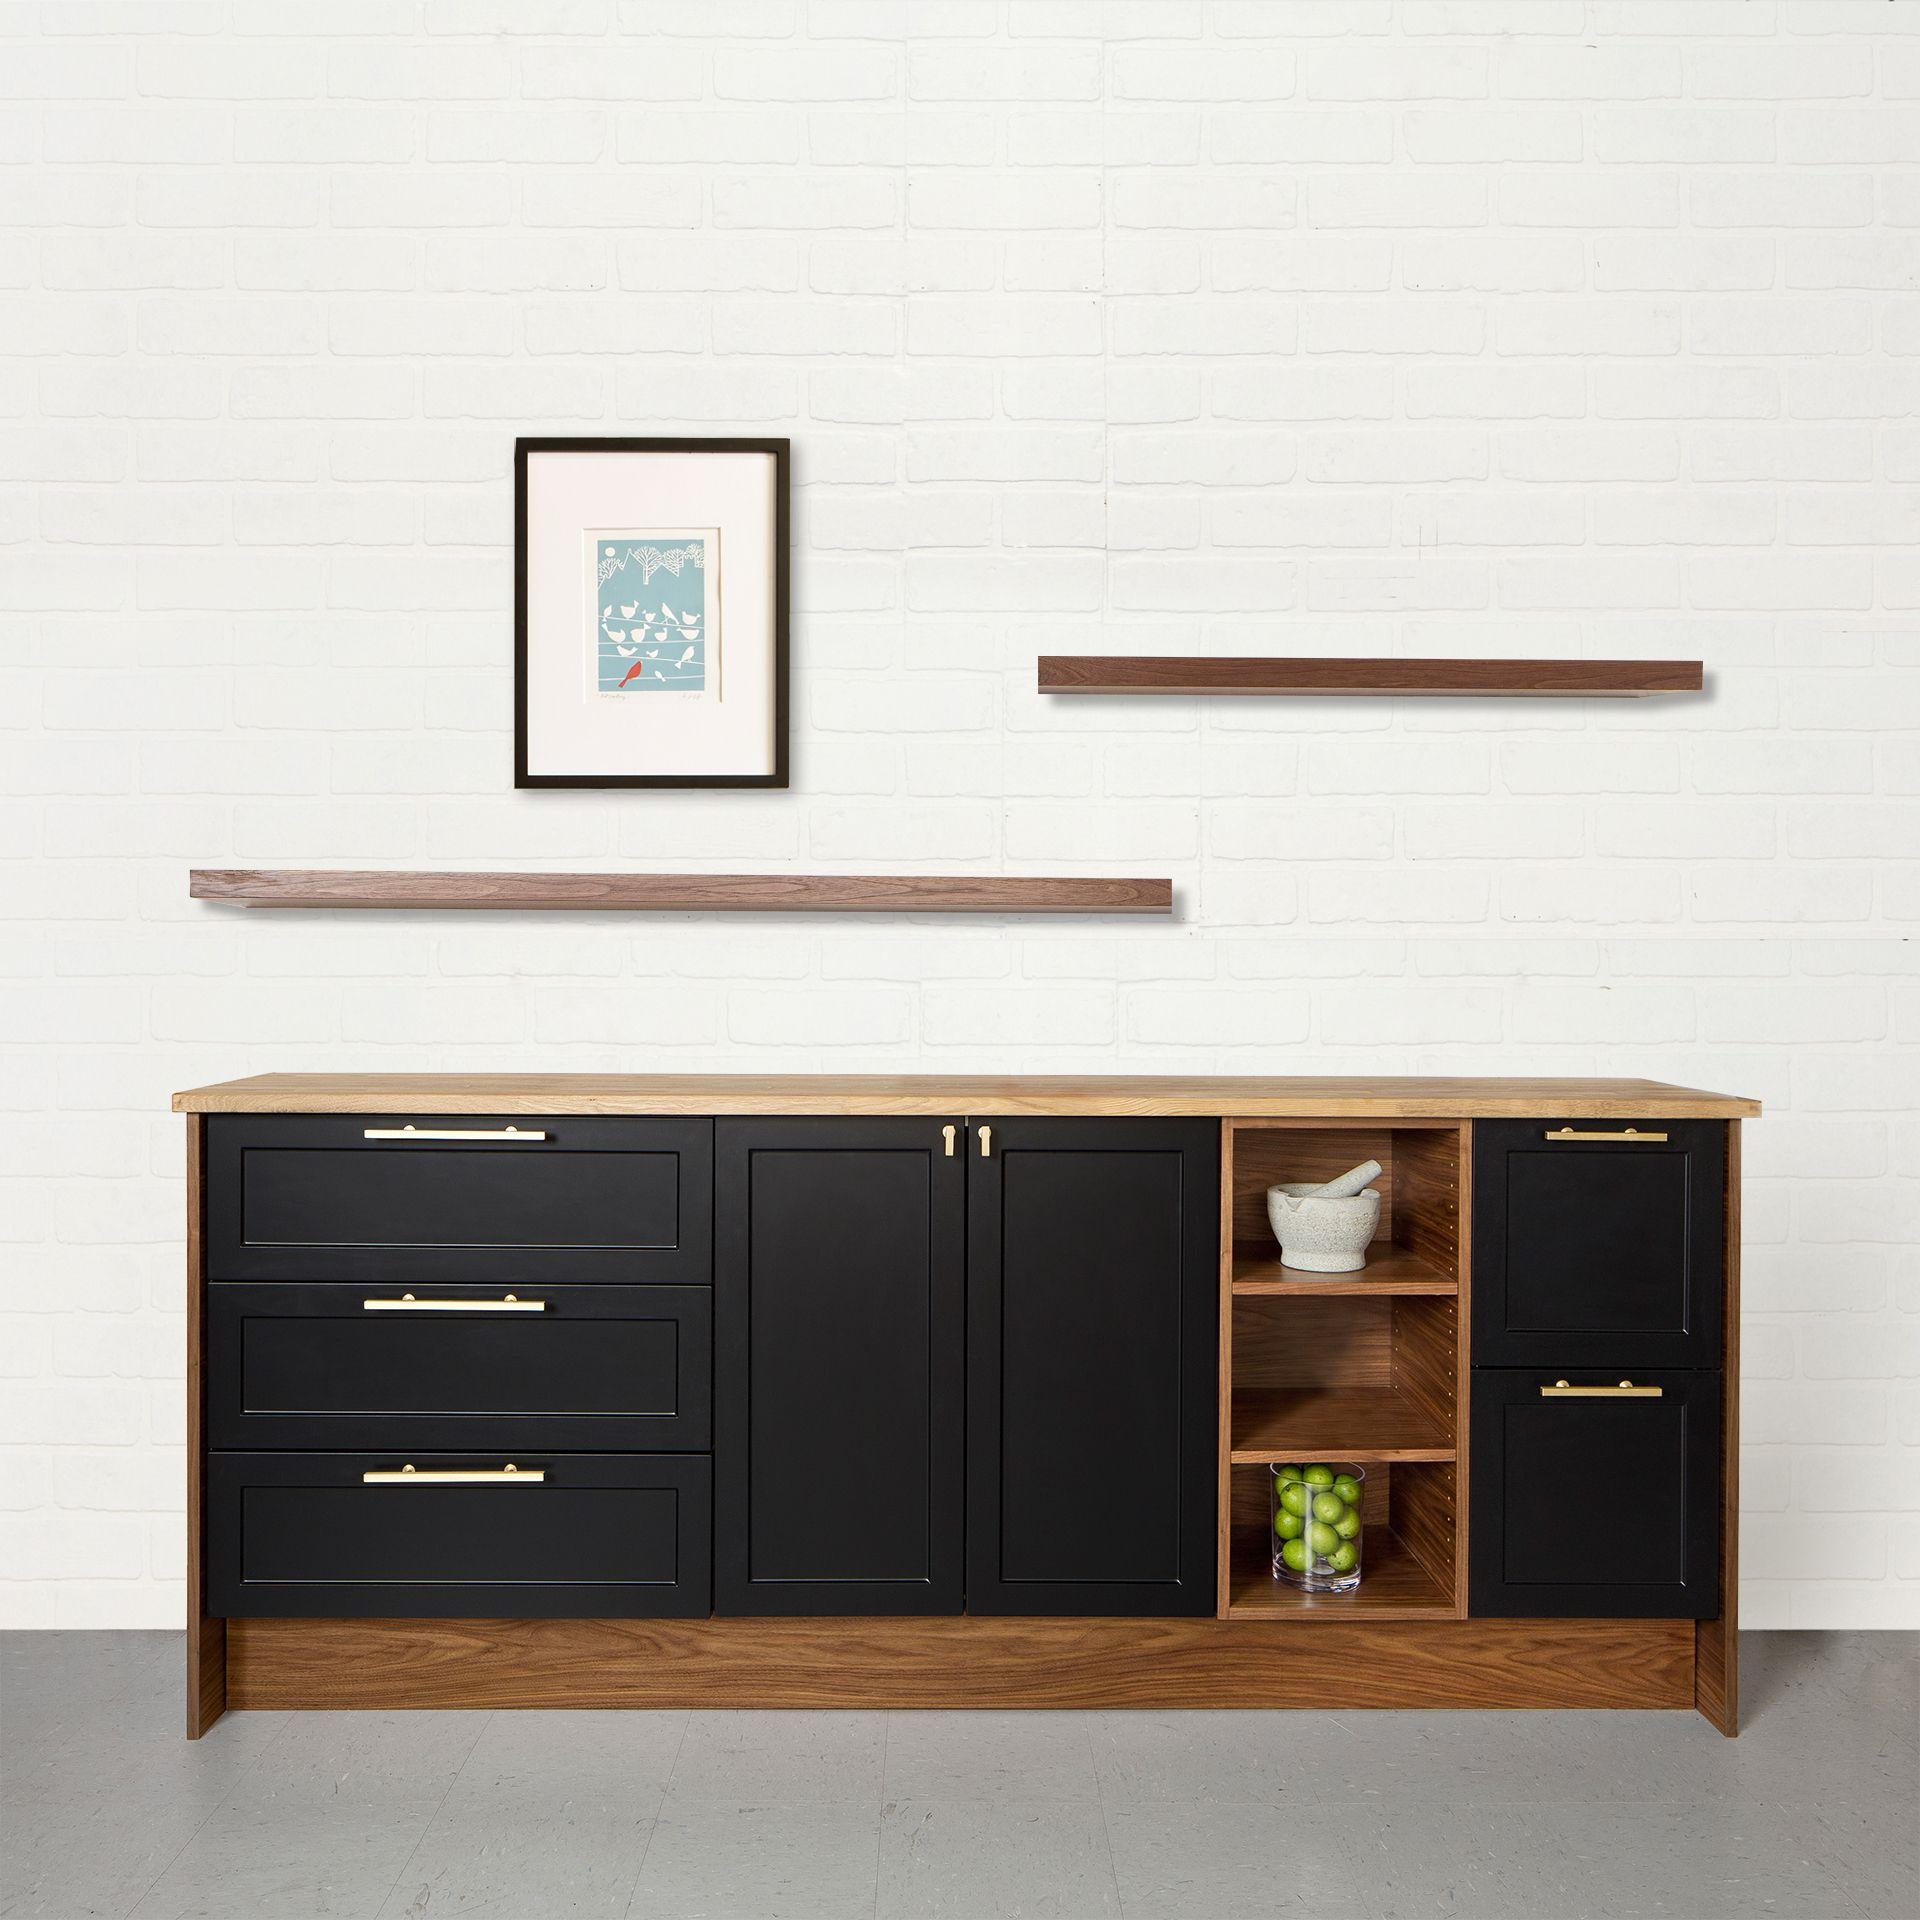 ikea shaker kitchen cabinets contractor nj semihandmade supermatte black